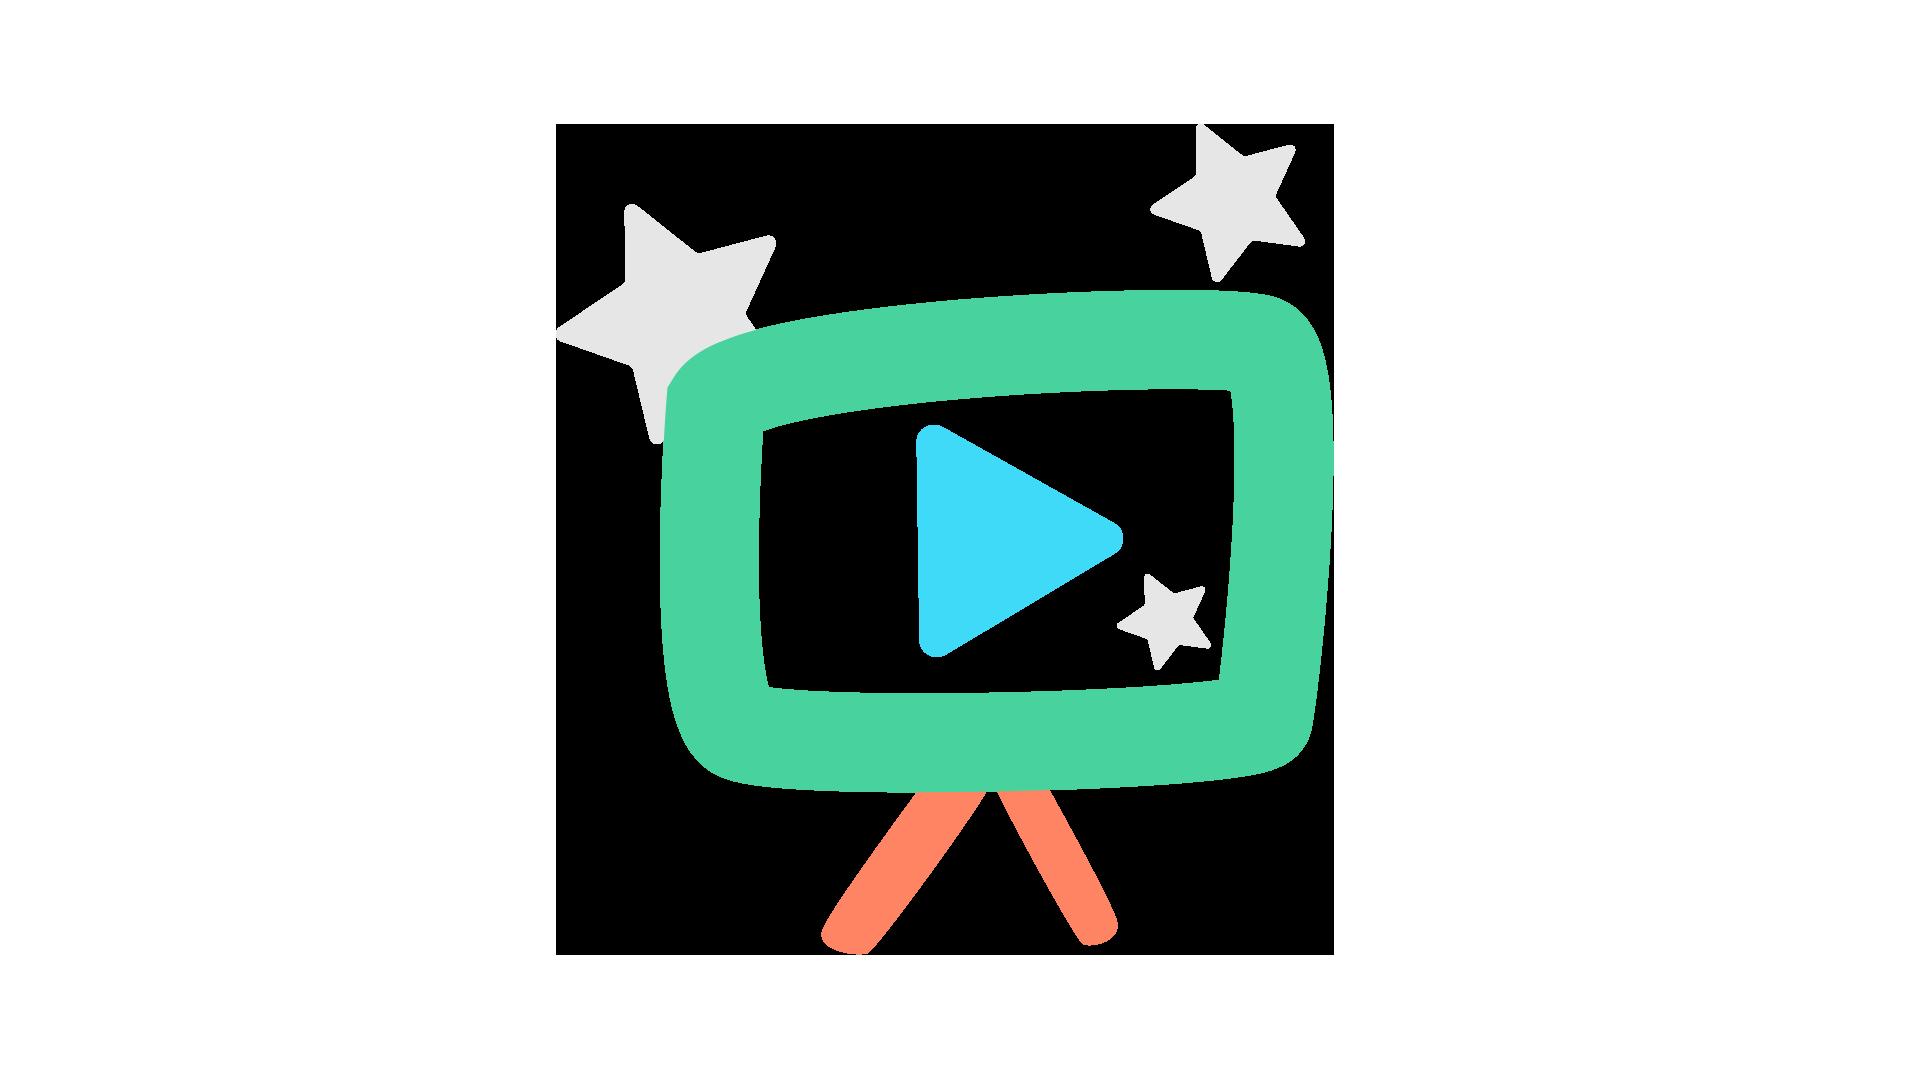 TV_16_9